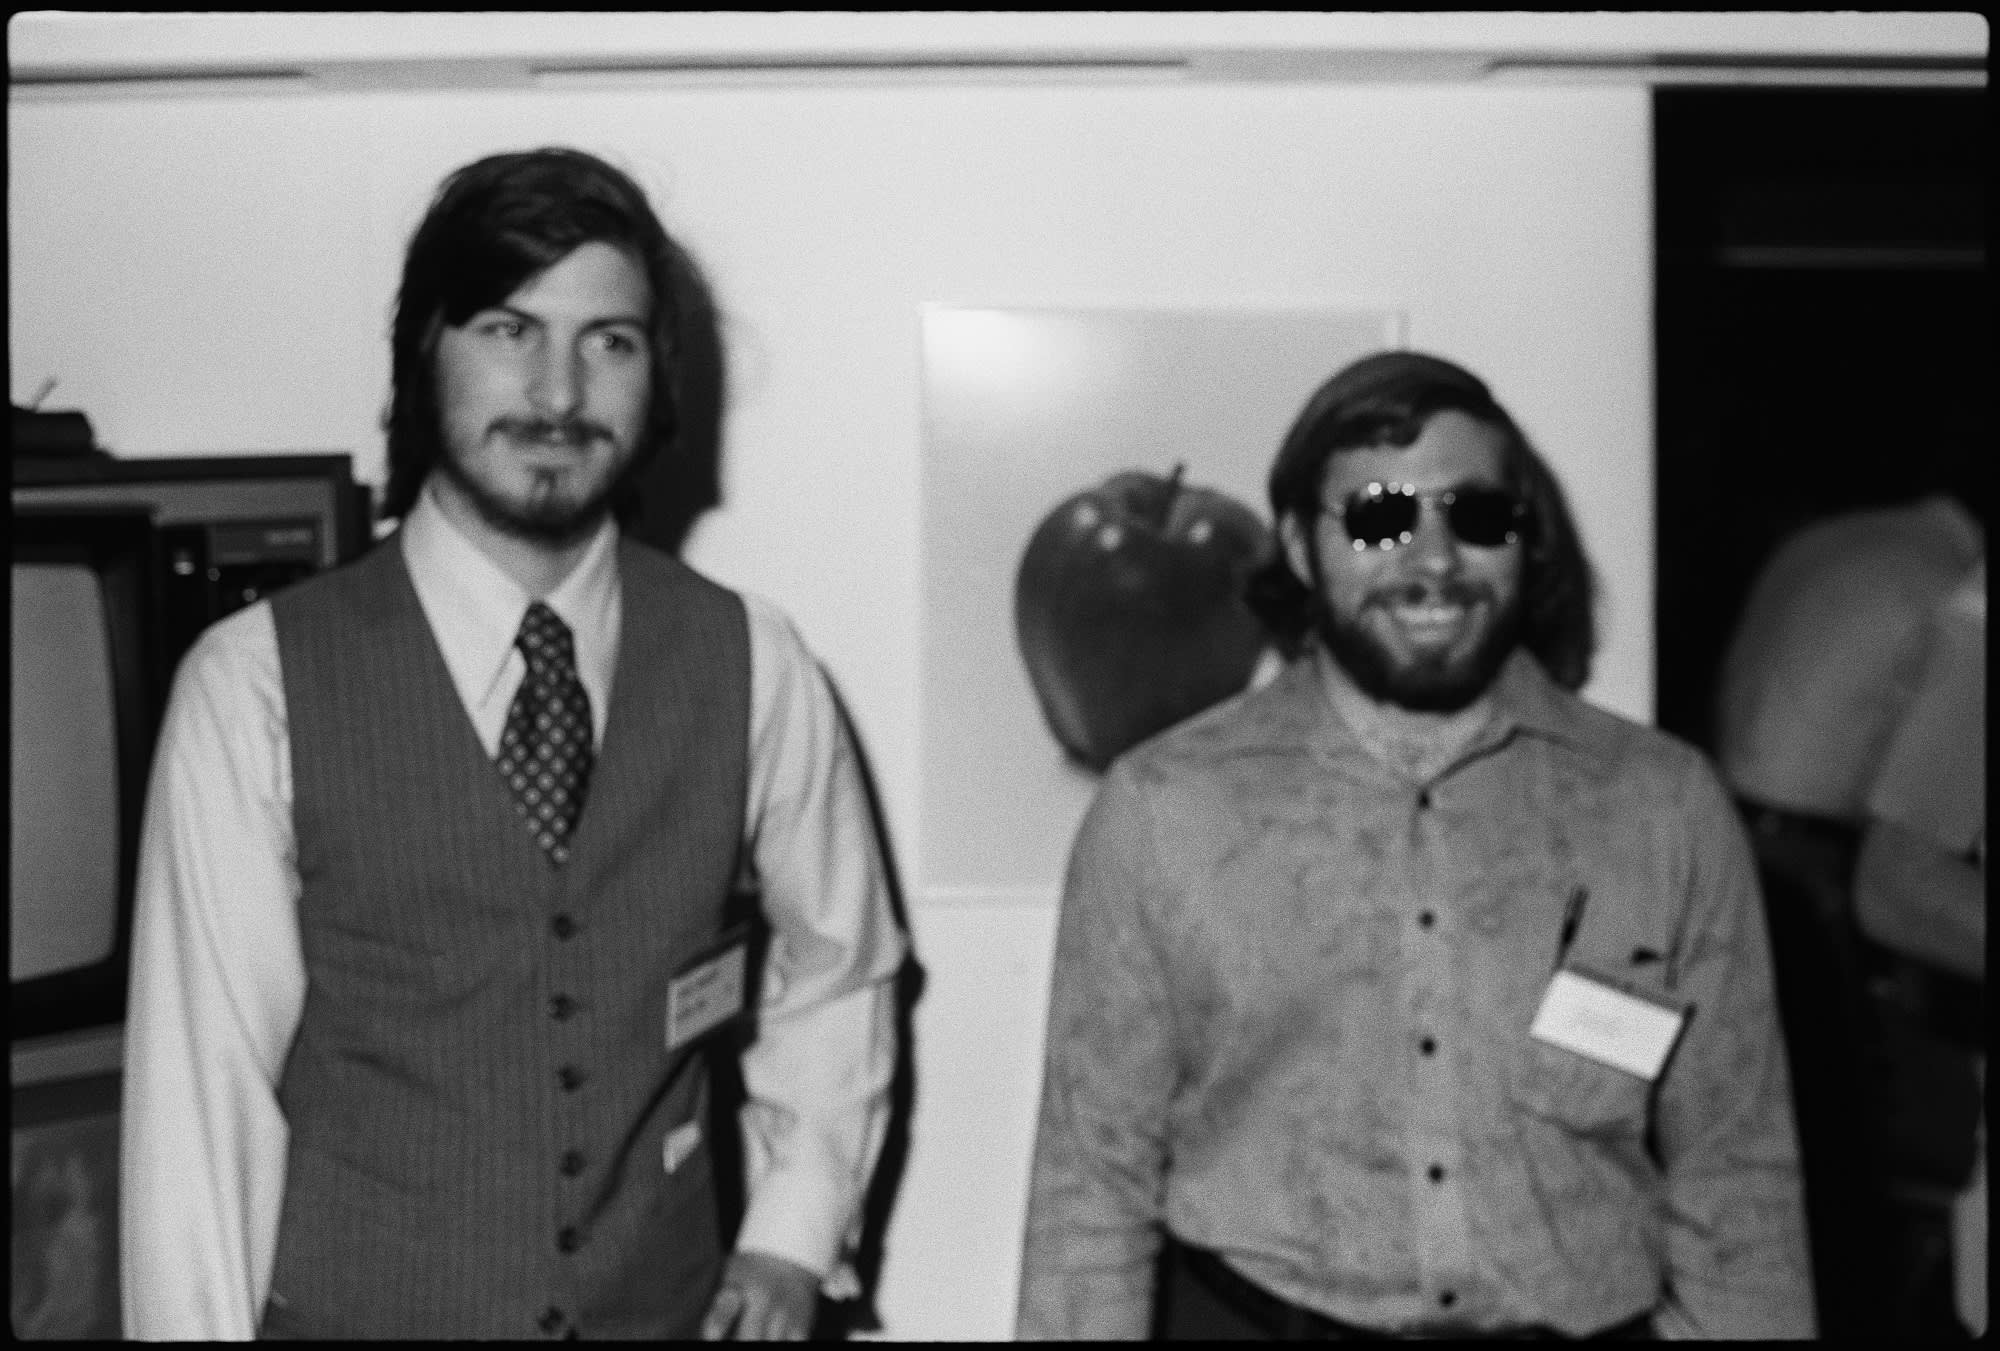 Steve Wozniak: When Apple got 'big money' Steve Jobs' personality 'changed' - CNBC